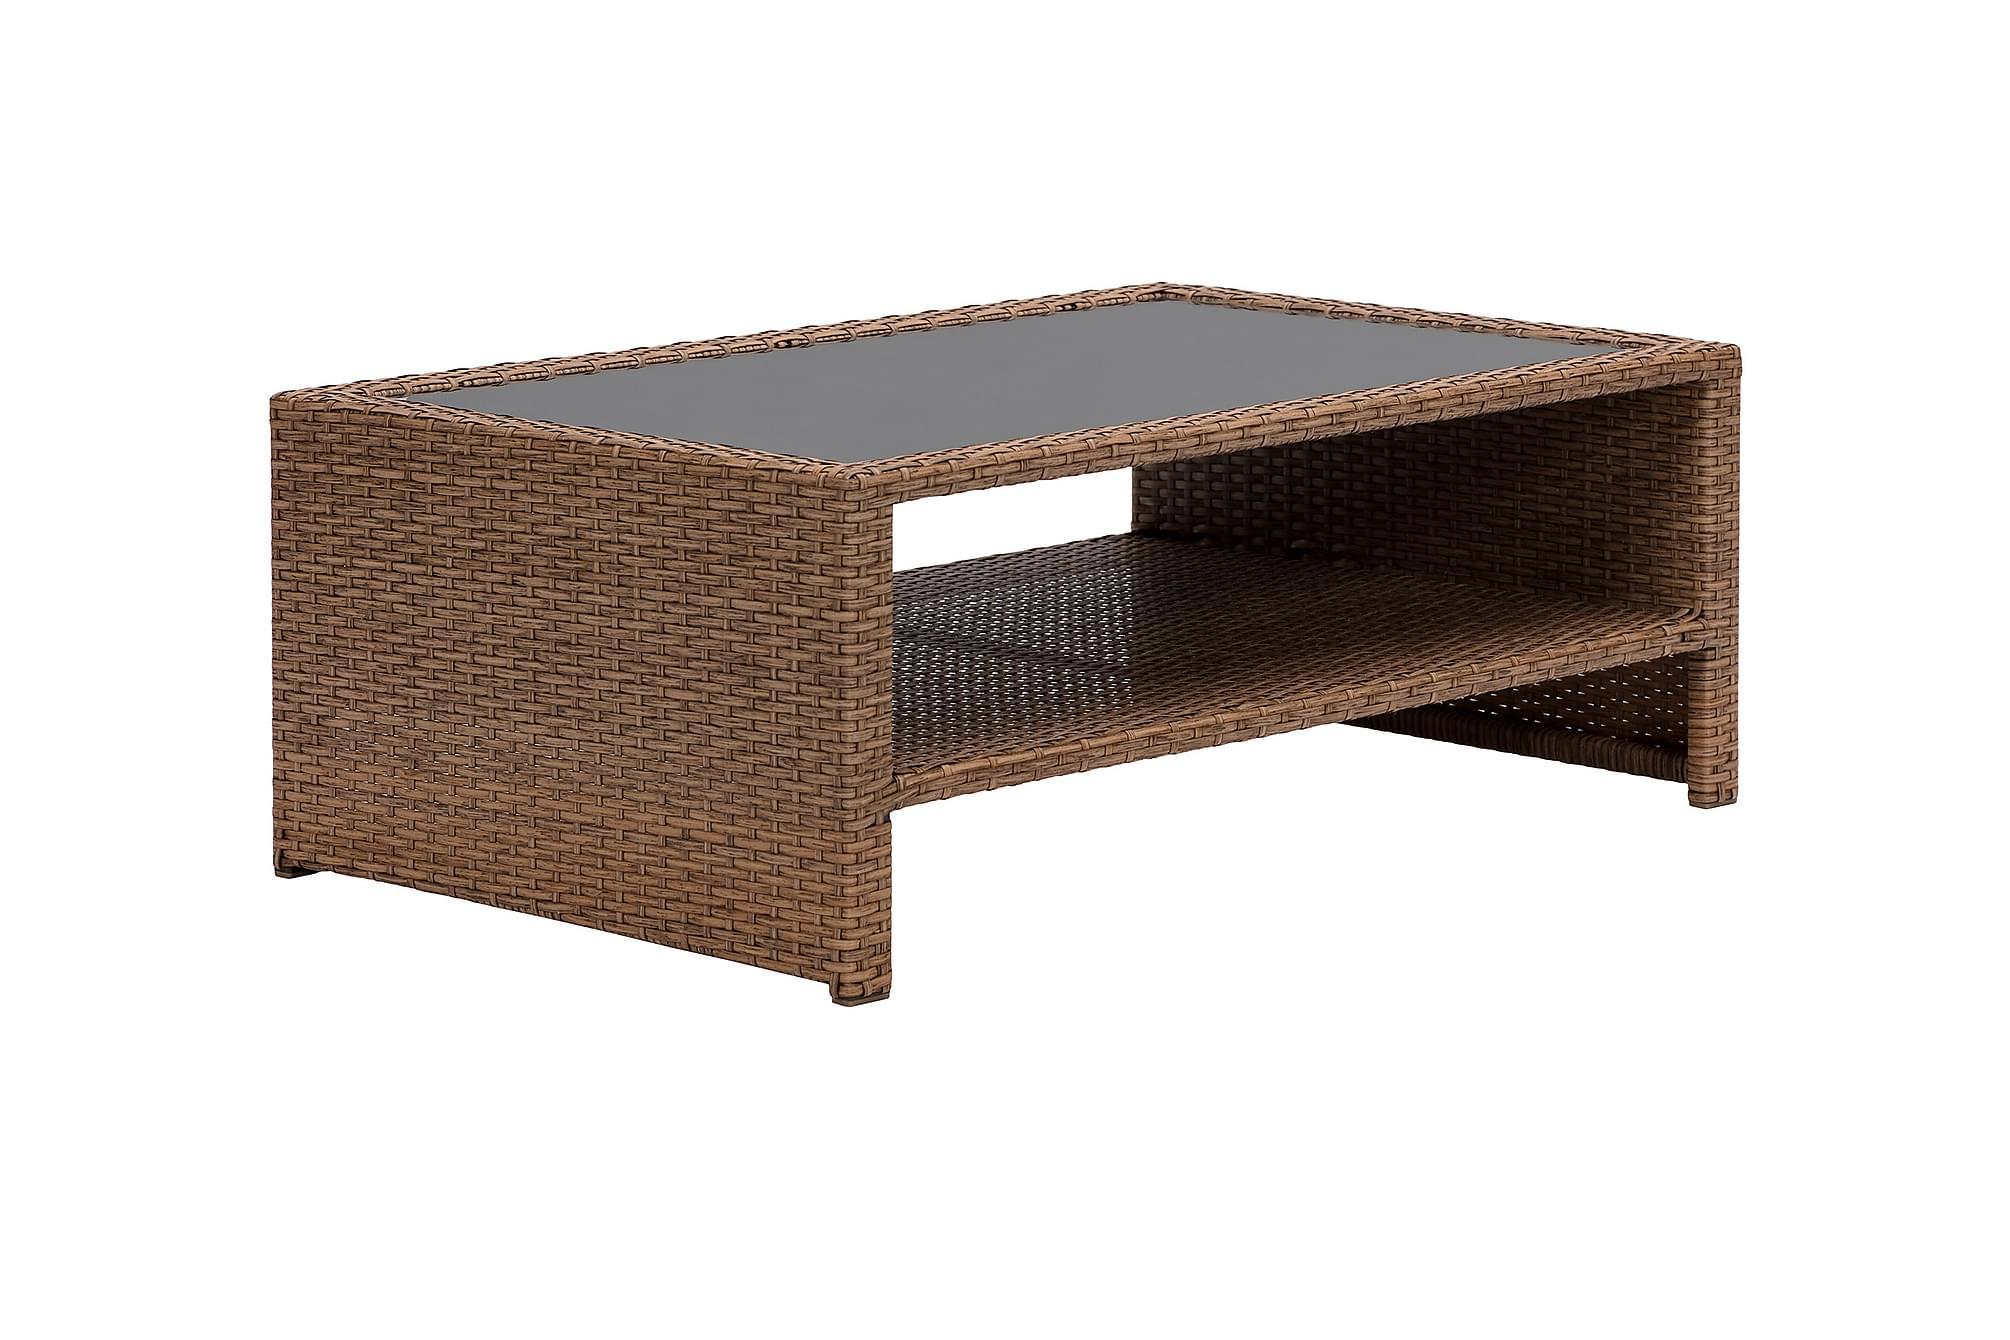 LUPO Soffbord med Hylla 100×65 Natur